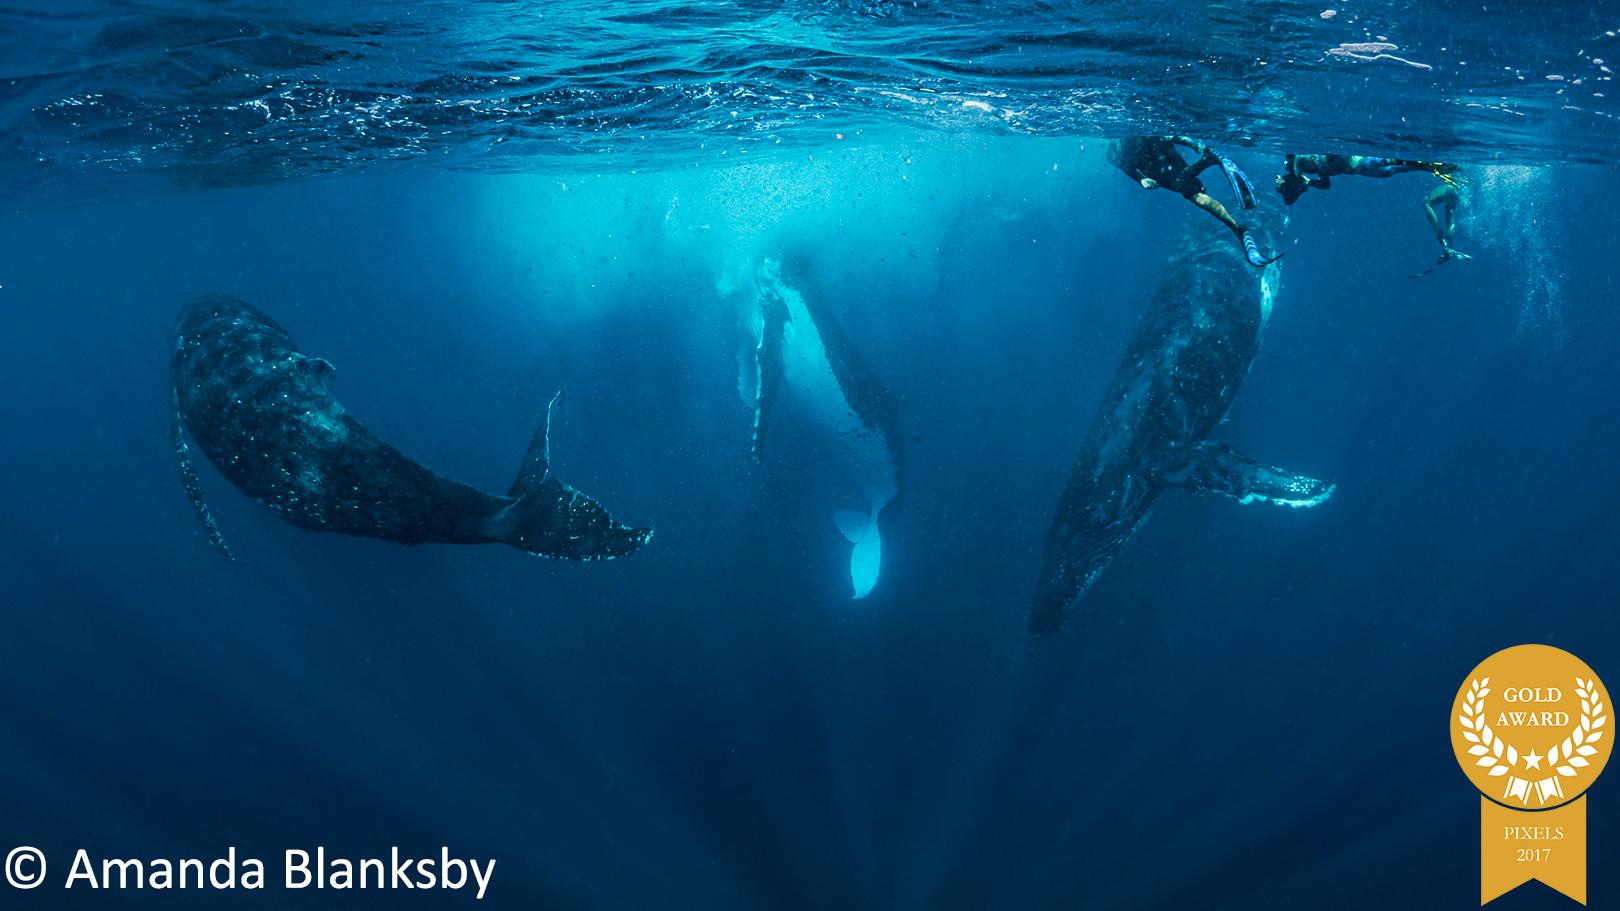 9-Amanda-Blanksby-Pixels-19-November-Crazy-Whale-Threesome-